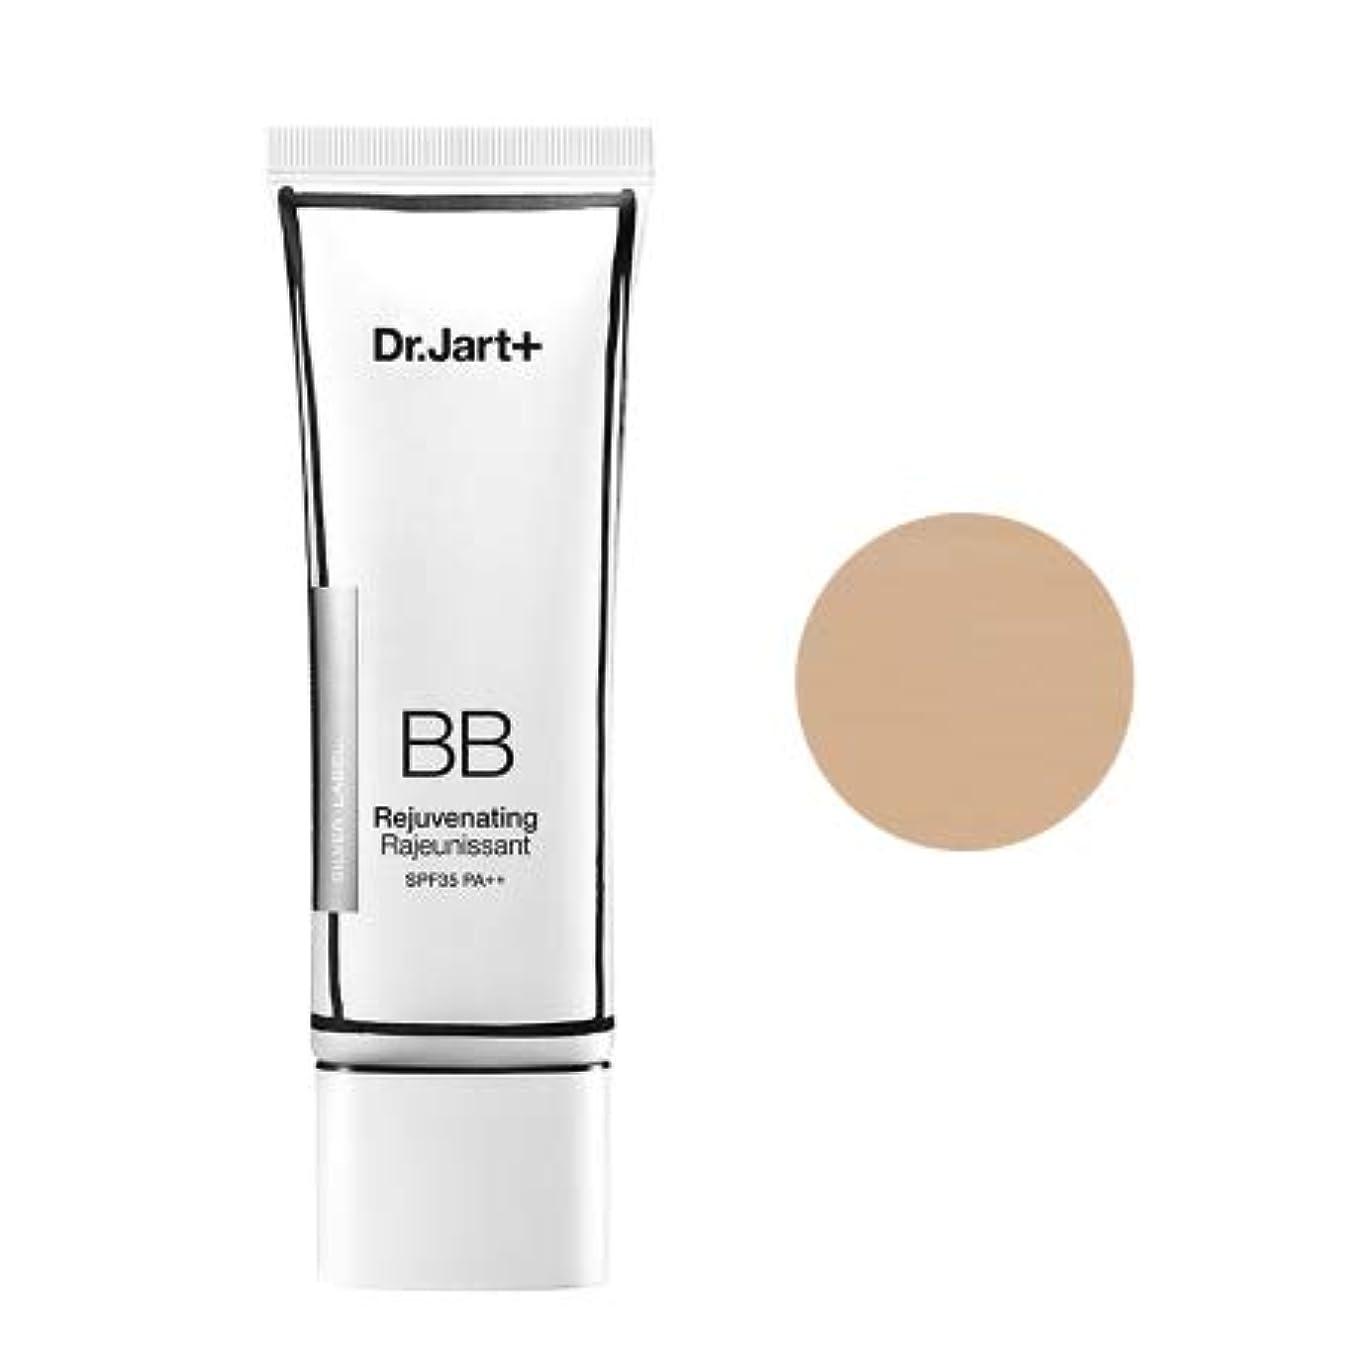 [Upgrade] Dr.Jart+Dermakeup Rejuvenating Beauty Balm SPF35 PA++ 50ml /ドクタージャルトゥザメーキャップリージュビネイティンビューティーバーム SPF35...